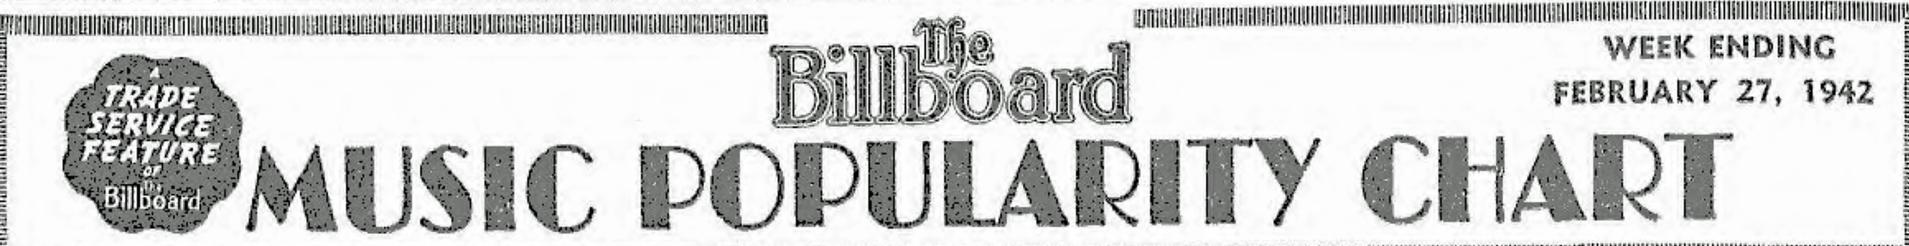 Billboard 1942-03-07-Music-Chart-(mcrfb cropped)b